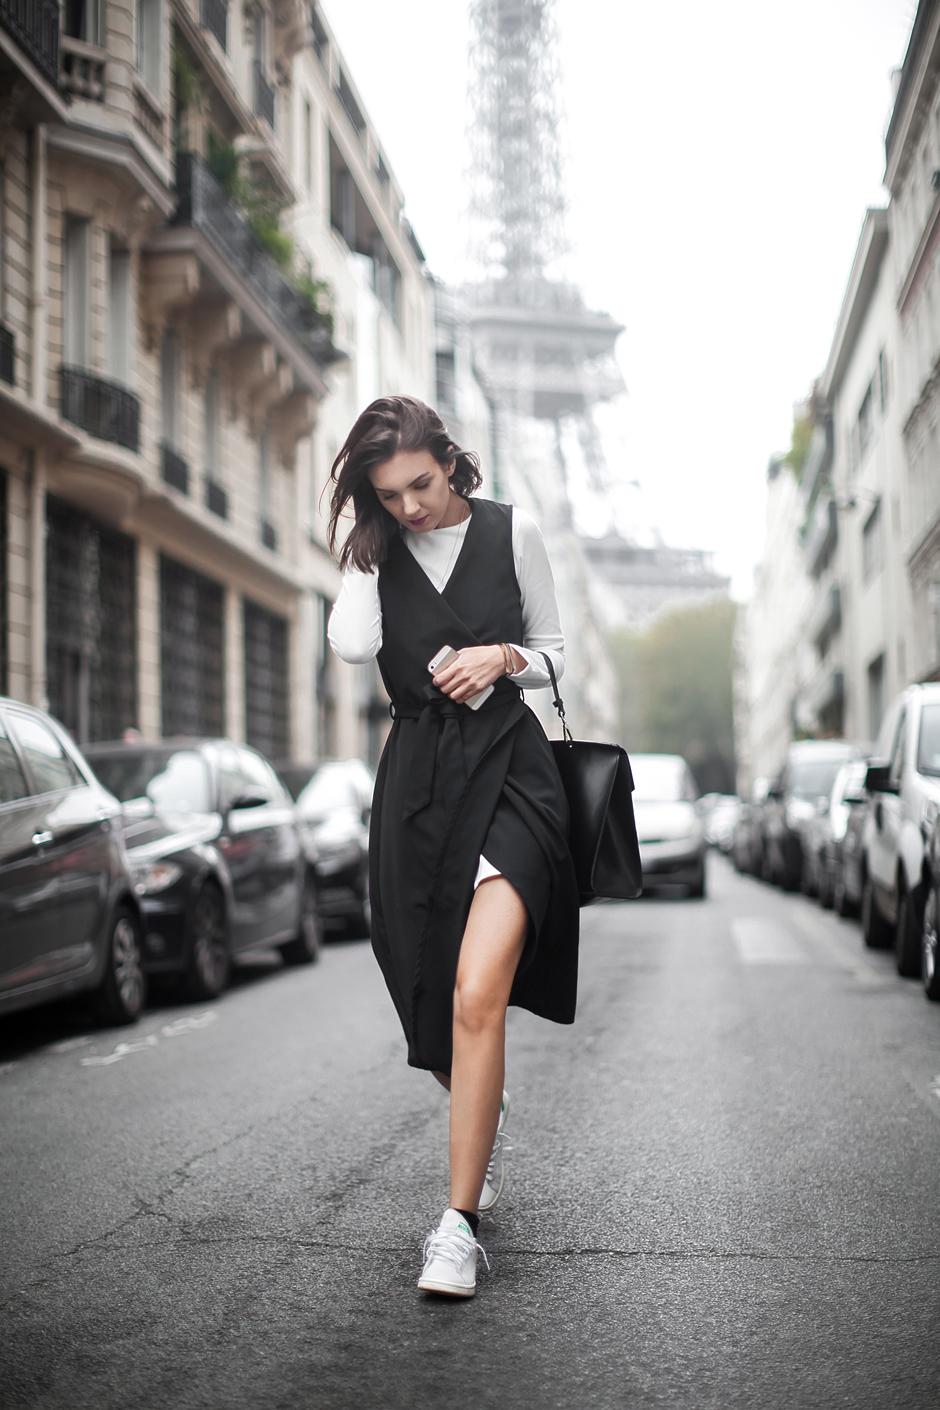 paris-fashion-blogger-eiffel-tower-look